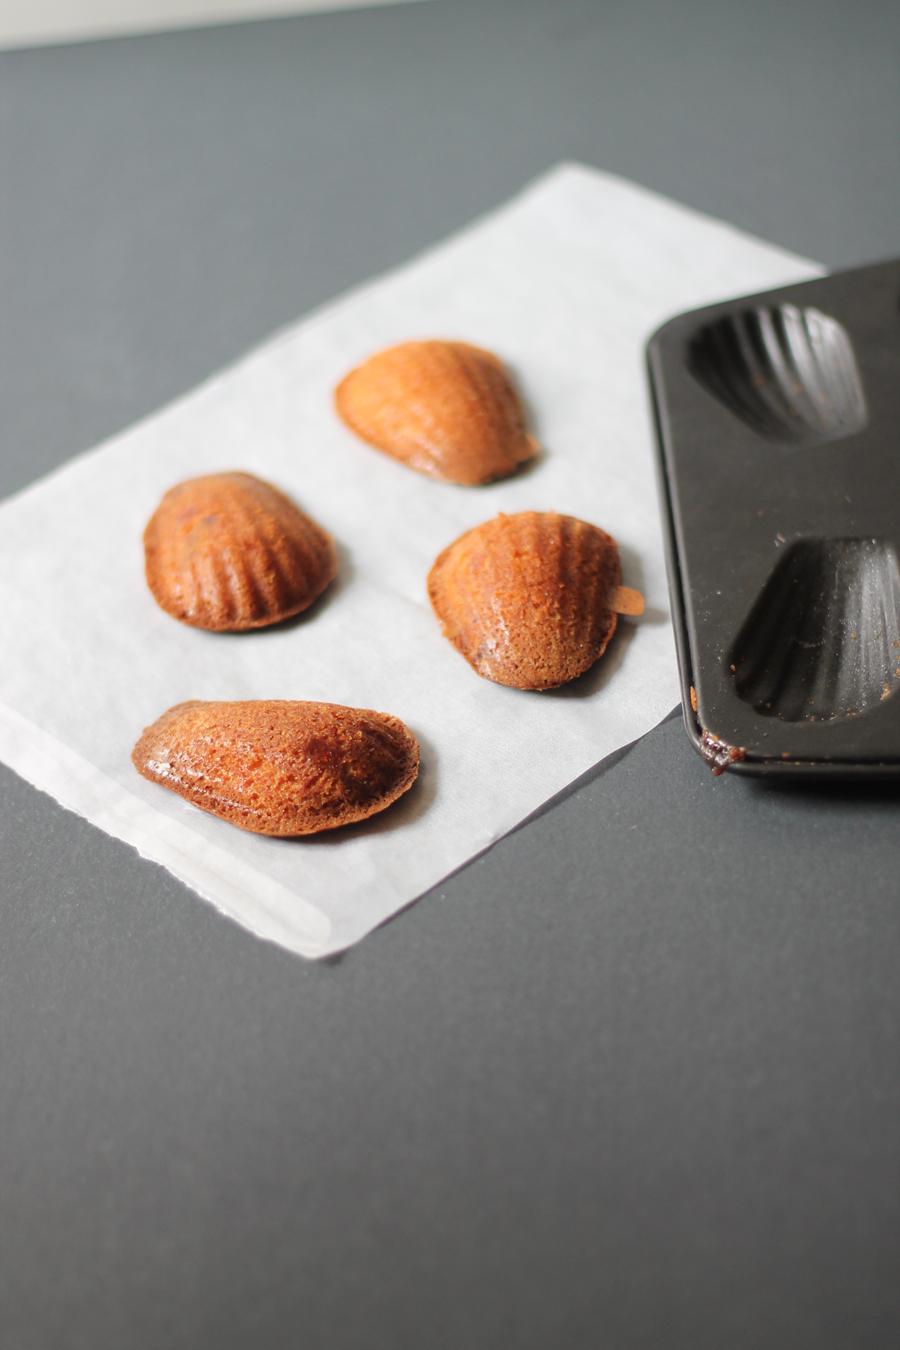 Marmalade madeleines